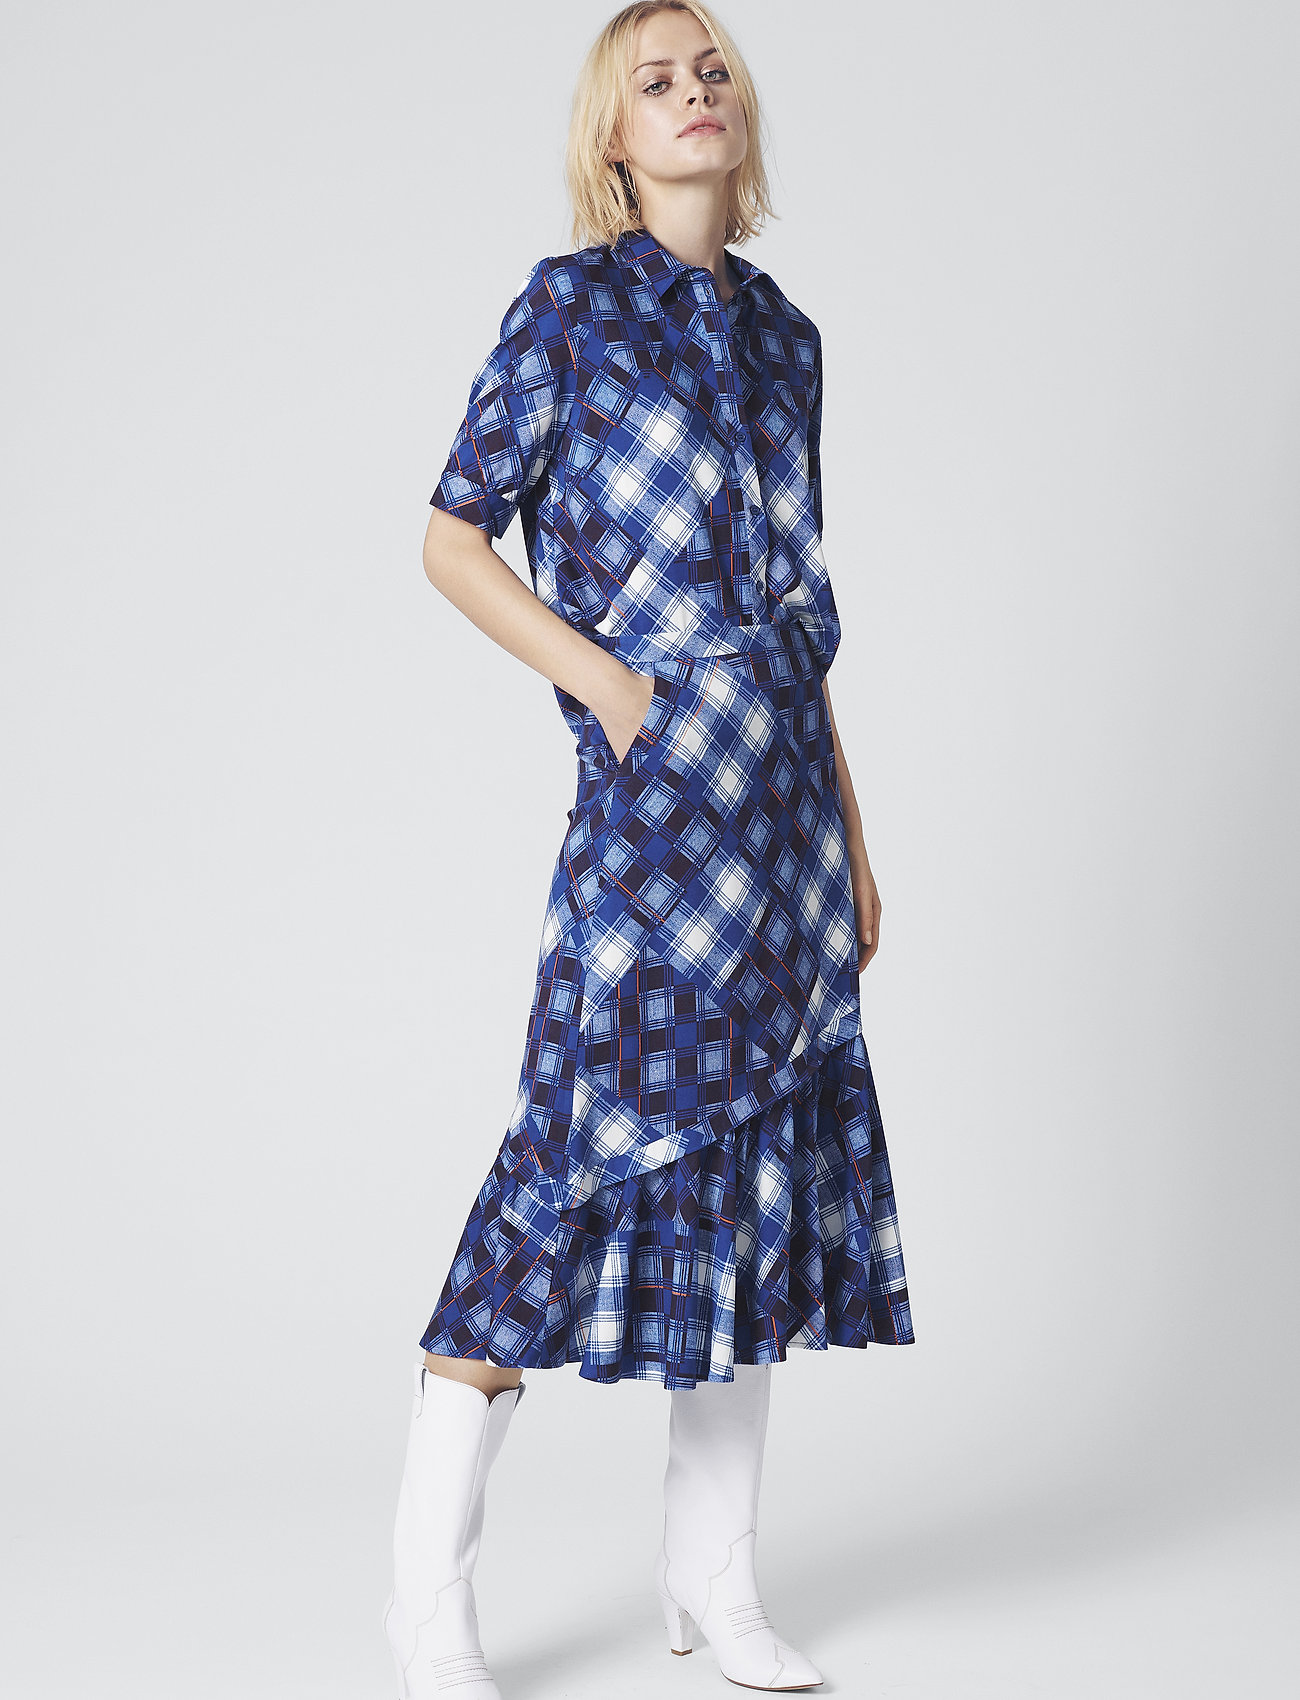 Gestuz - LuanneGZ skirt MA19 - midi - blue check